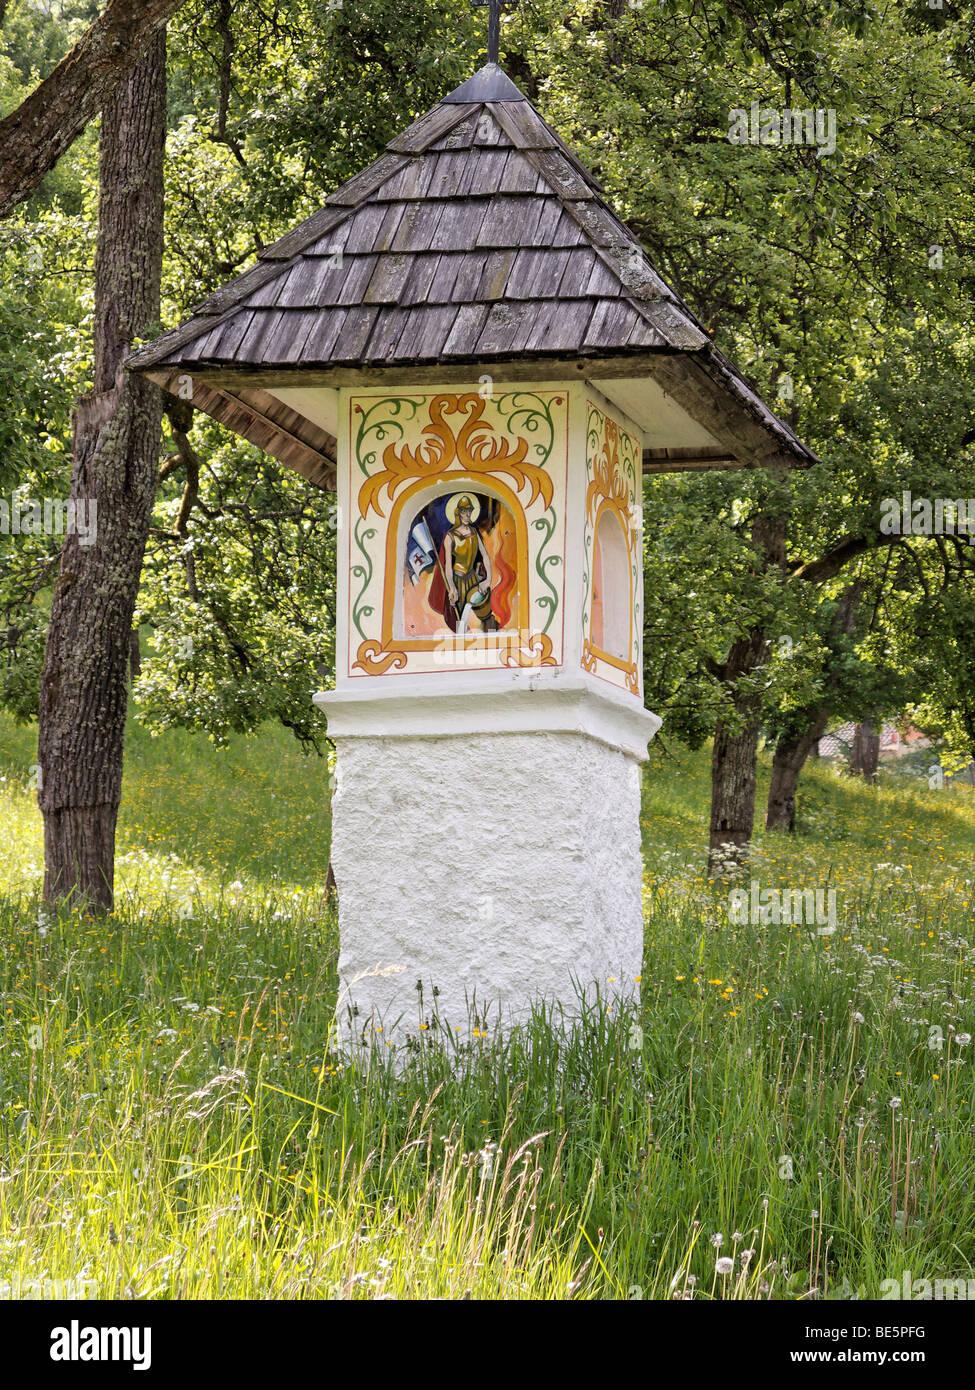 Bildstock in der Nähe von Gorenjska Kupljenik, in der Nähe von Bled, Slowenien Stockbild